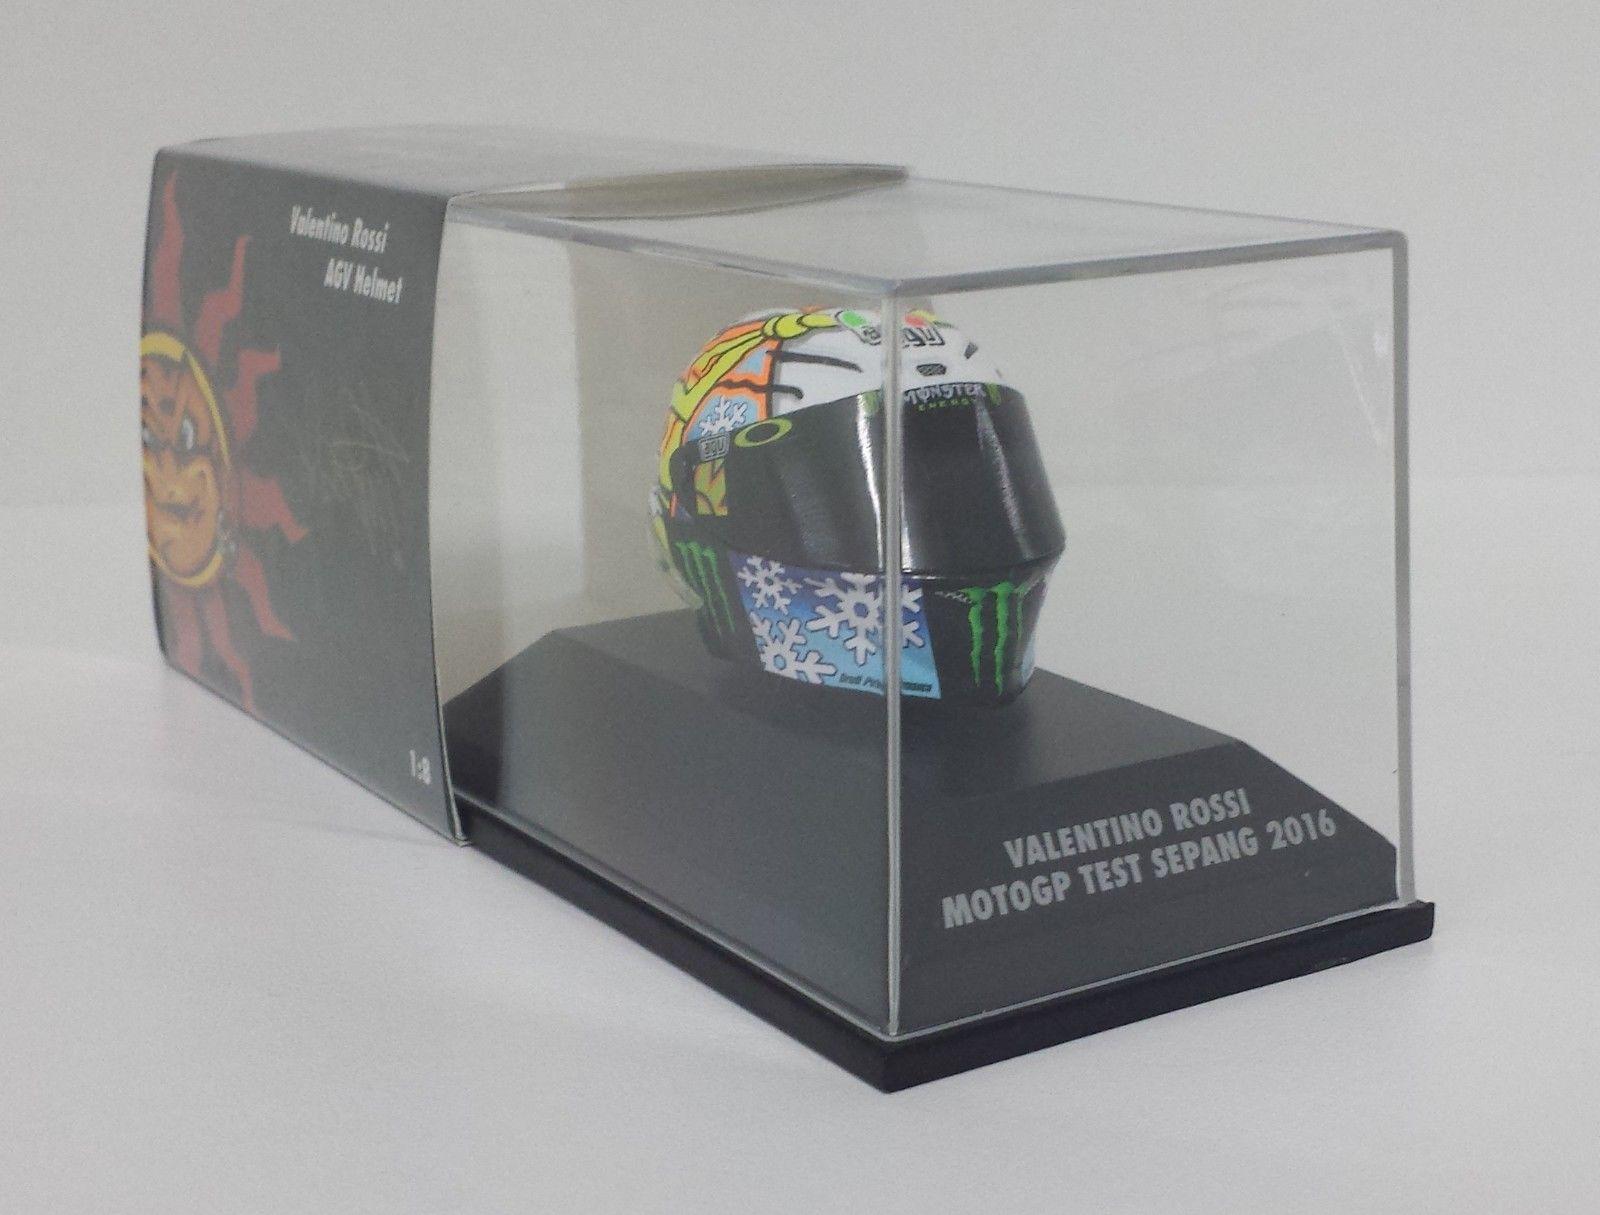 MINICHAMPS VALENTINO ROSSI MODELLINO AGV CASCO HELMET 1/8 TEST MOTOGP SEPANG 2016 NEW